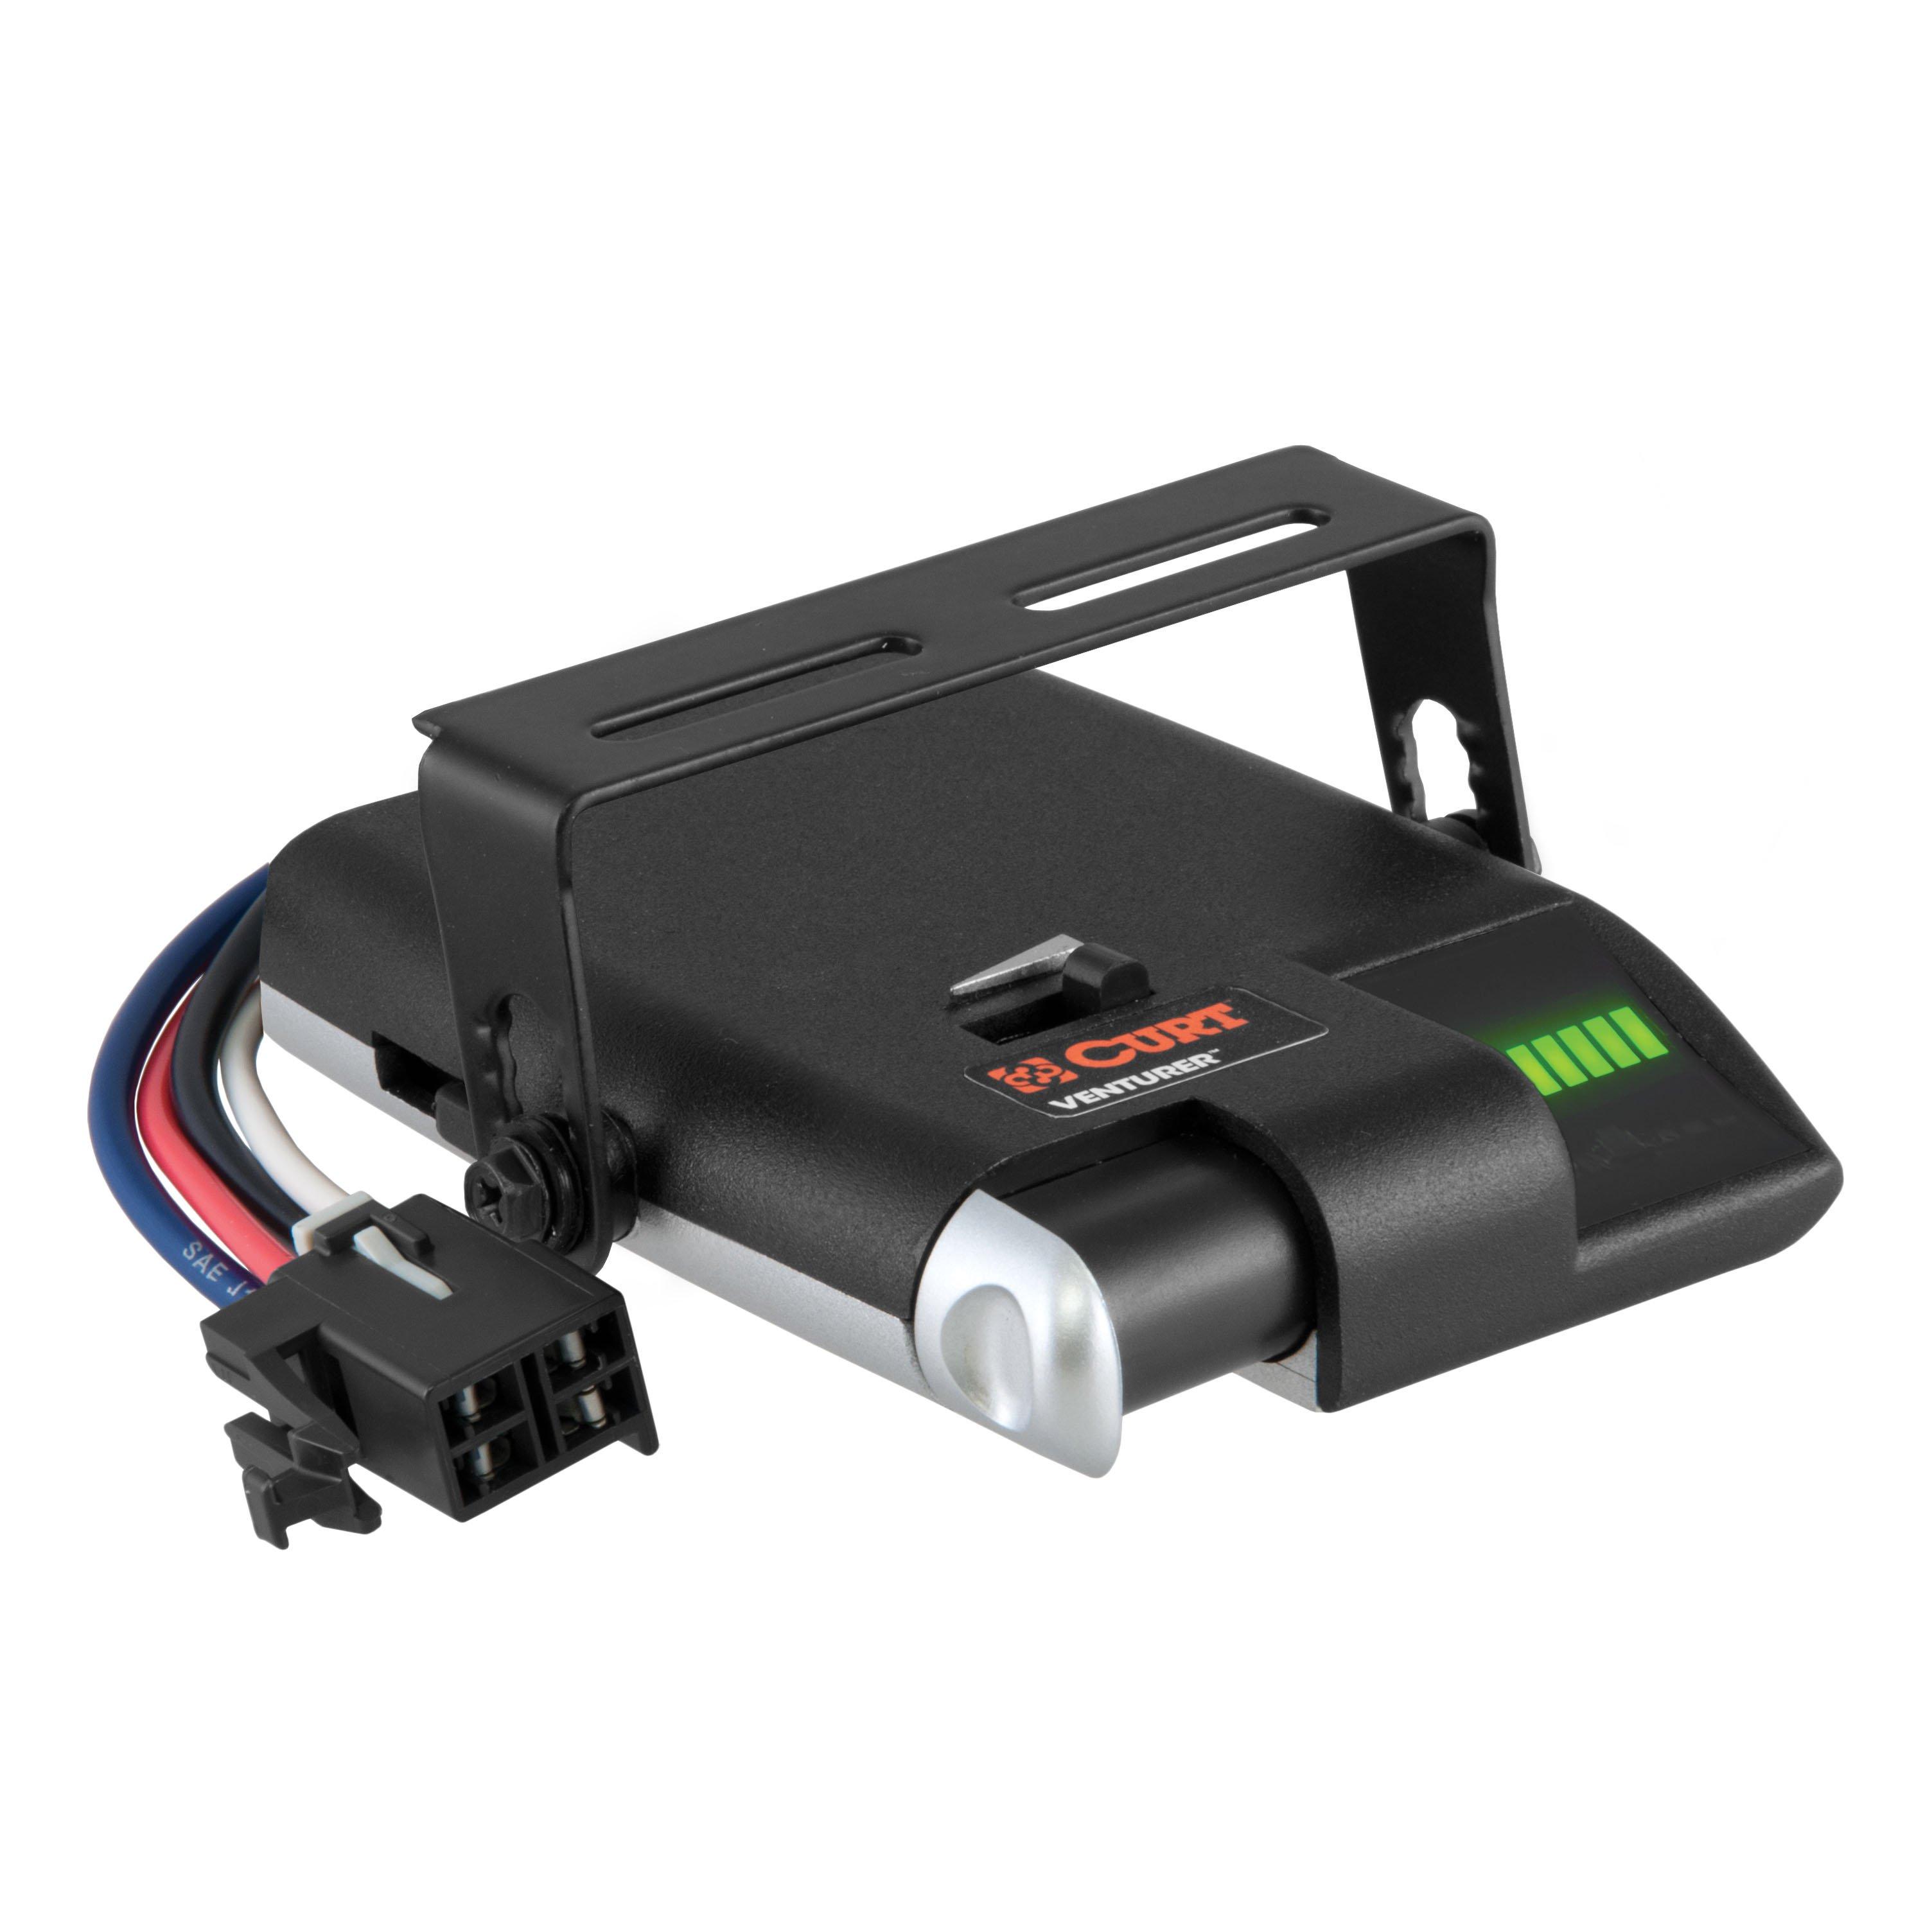 Gmc Sierra Trailer Wiring Diagram Best Collection Electrical Wiring